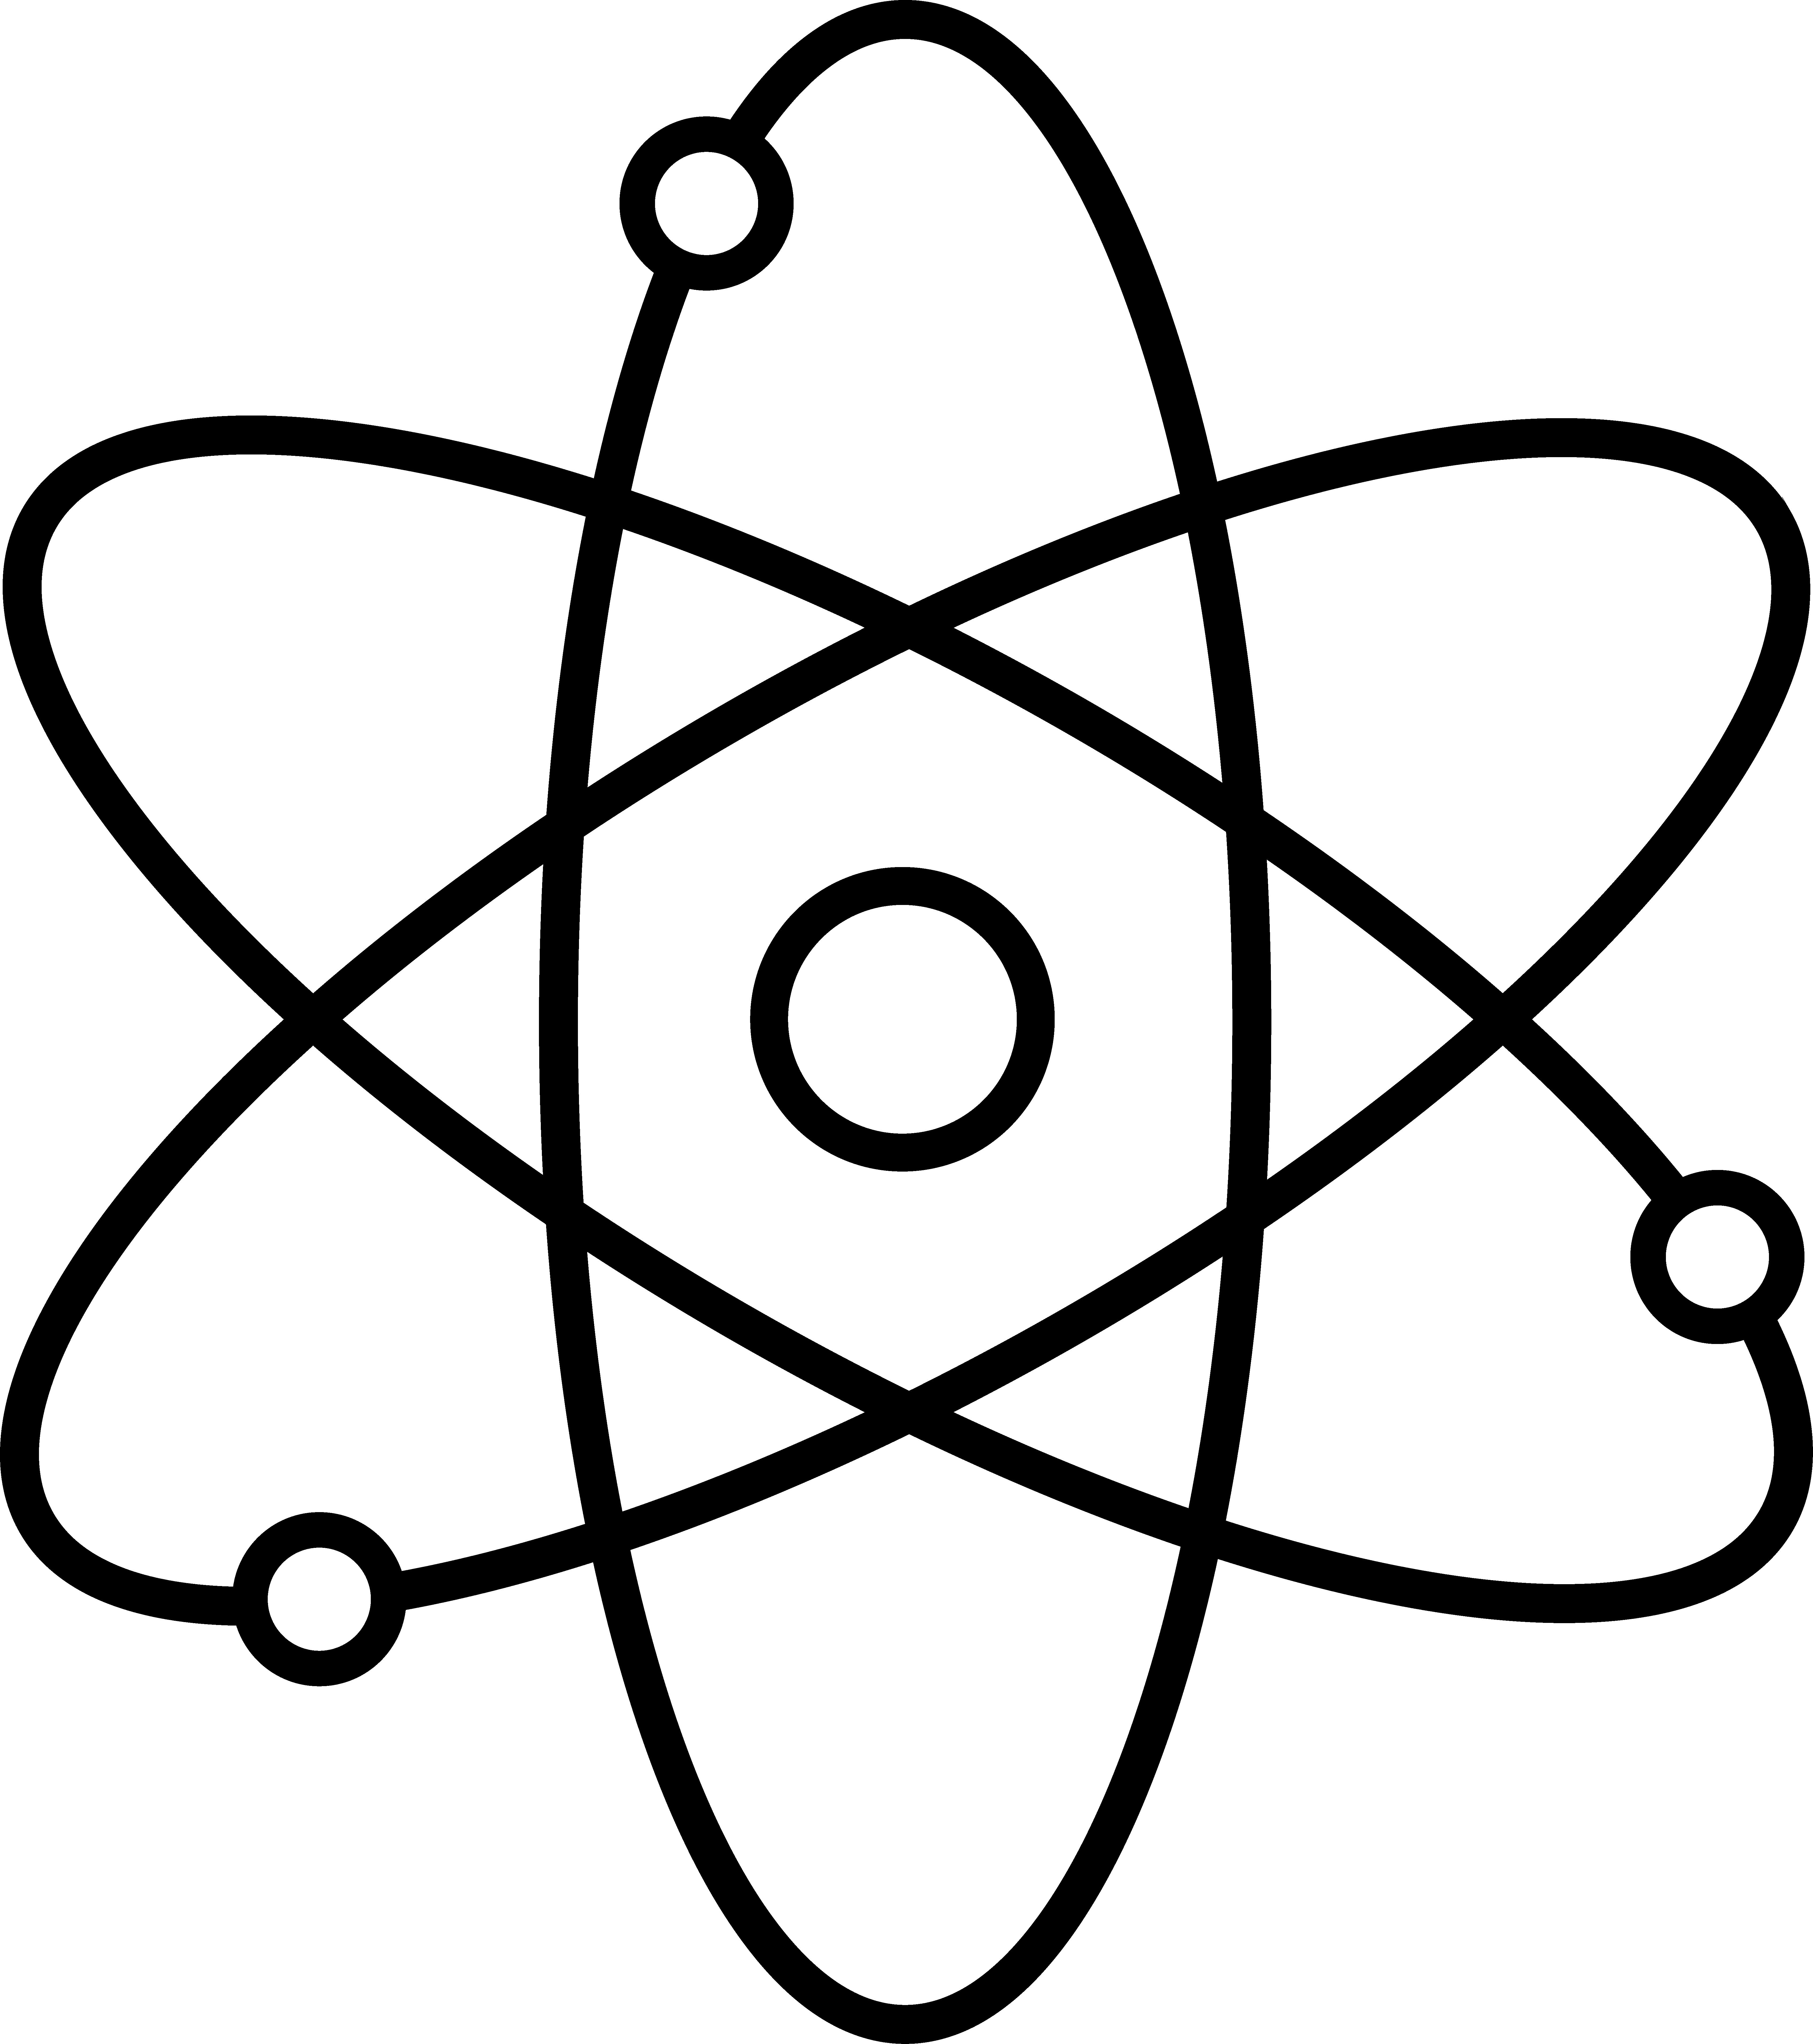 Atom Clipart.